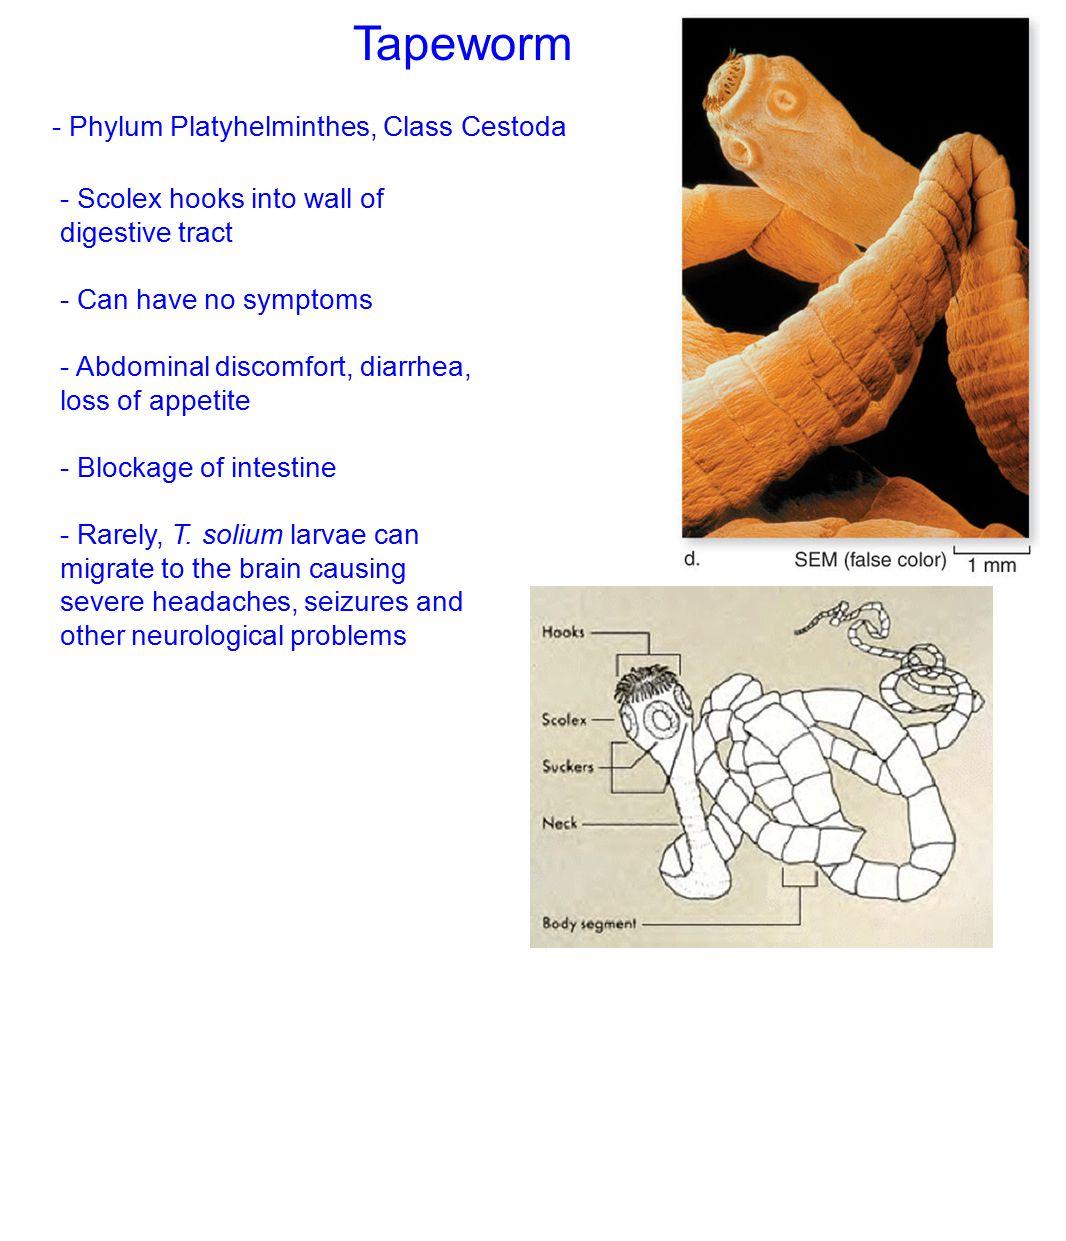 Tapeworm - Phylum Platyhelminthes, Class Cestoda